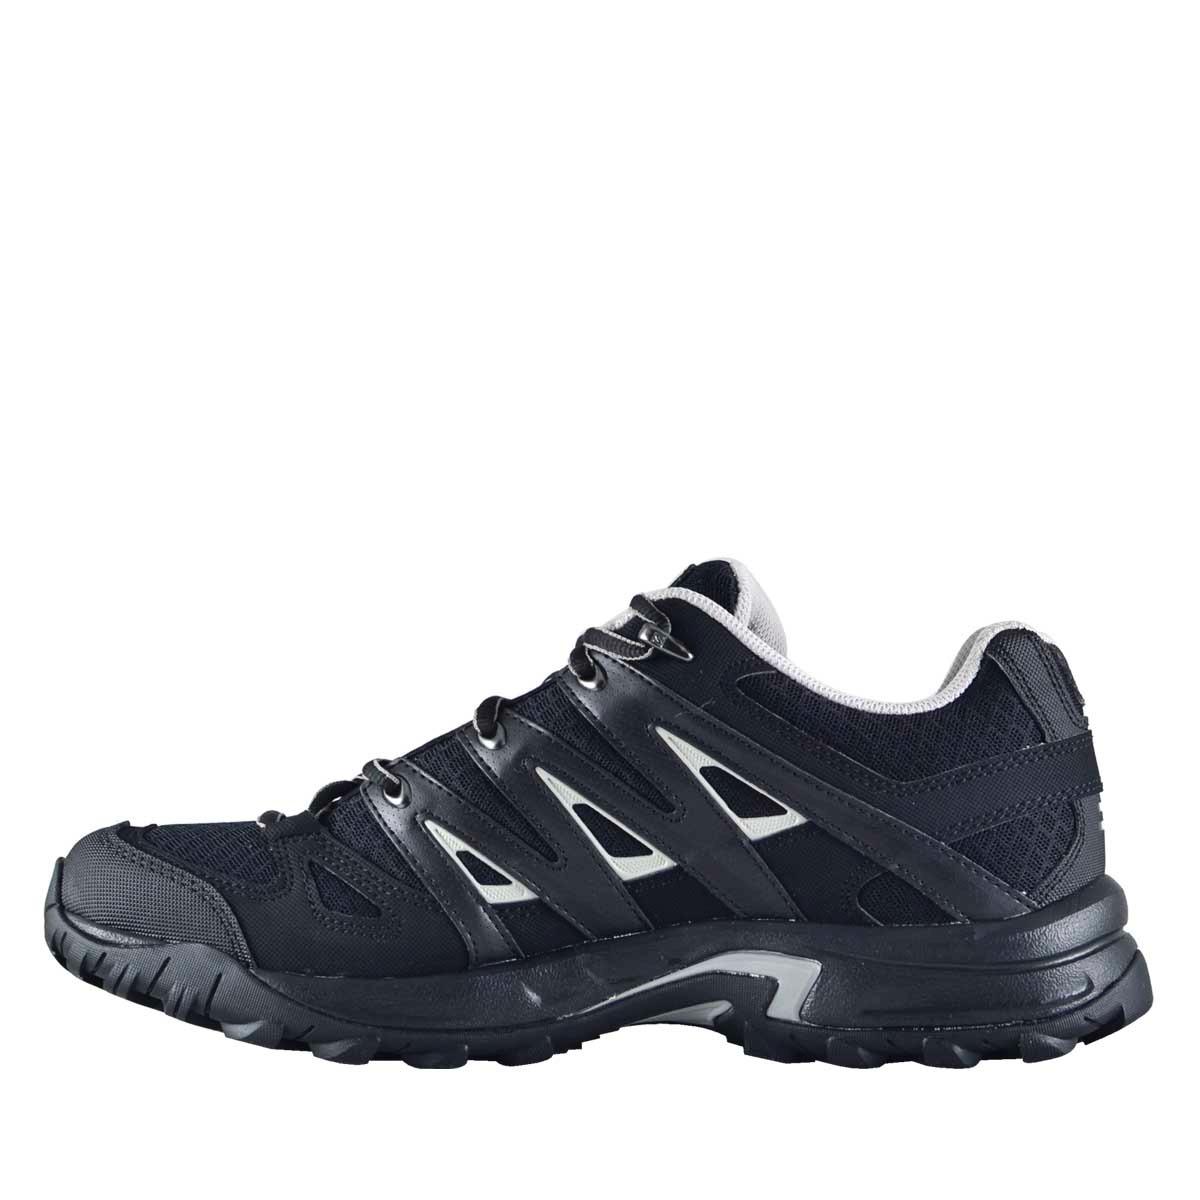 zapatillas salomon eskape aero hiking hombre negro. Cargando zoom. 661401ac54